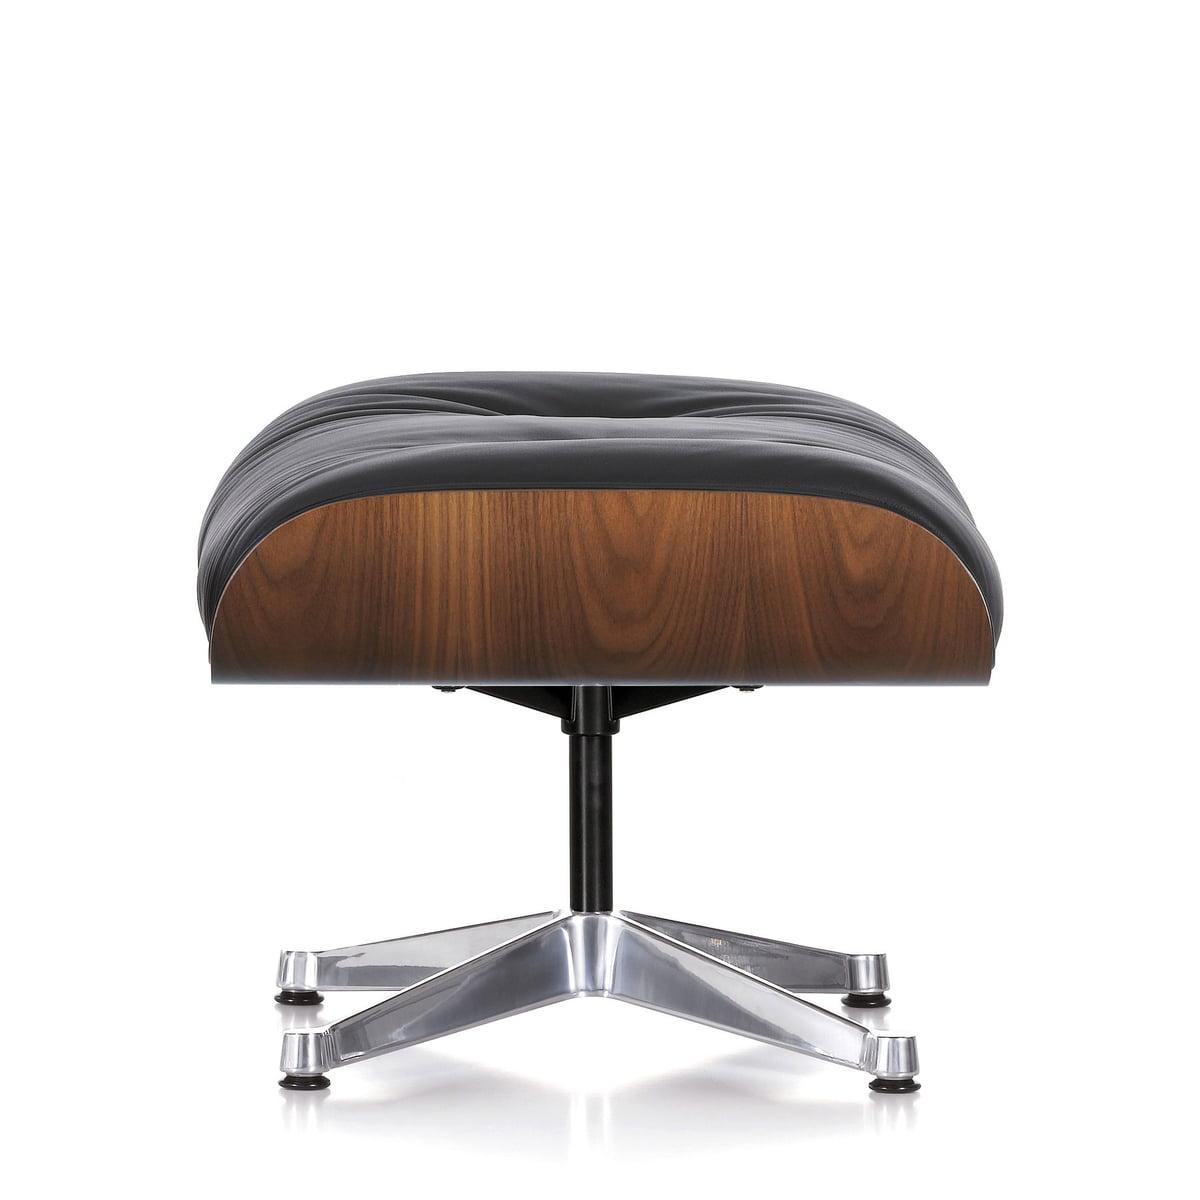 Vitra ottoman pour lounge chair for Vitra lounge chair nachbau